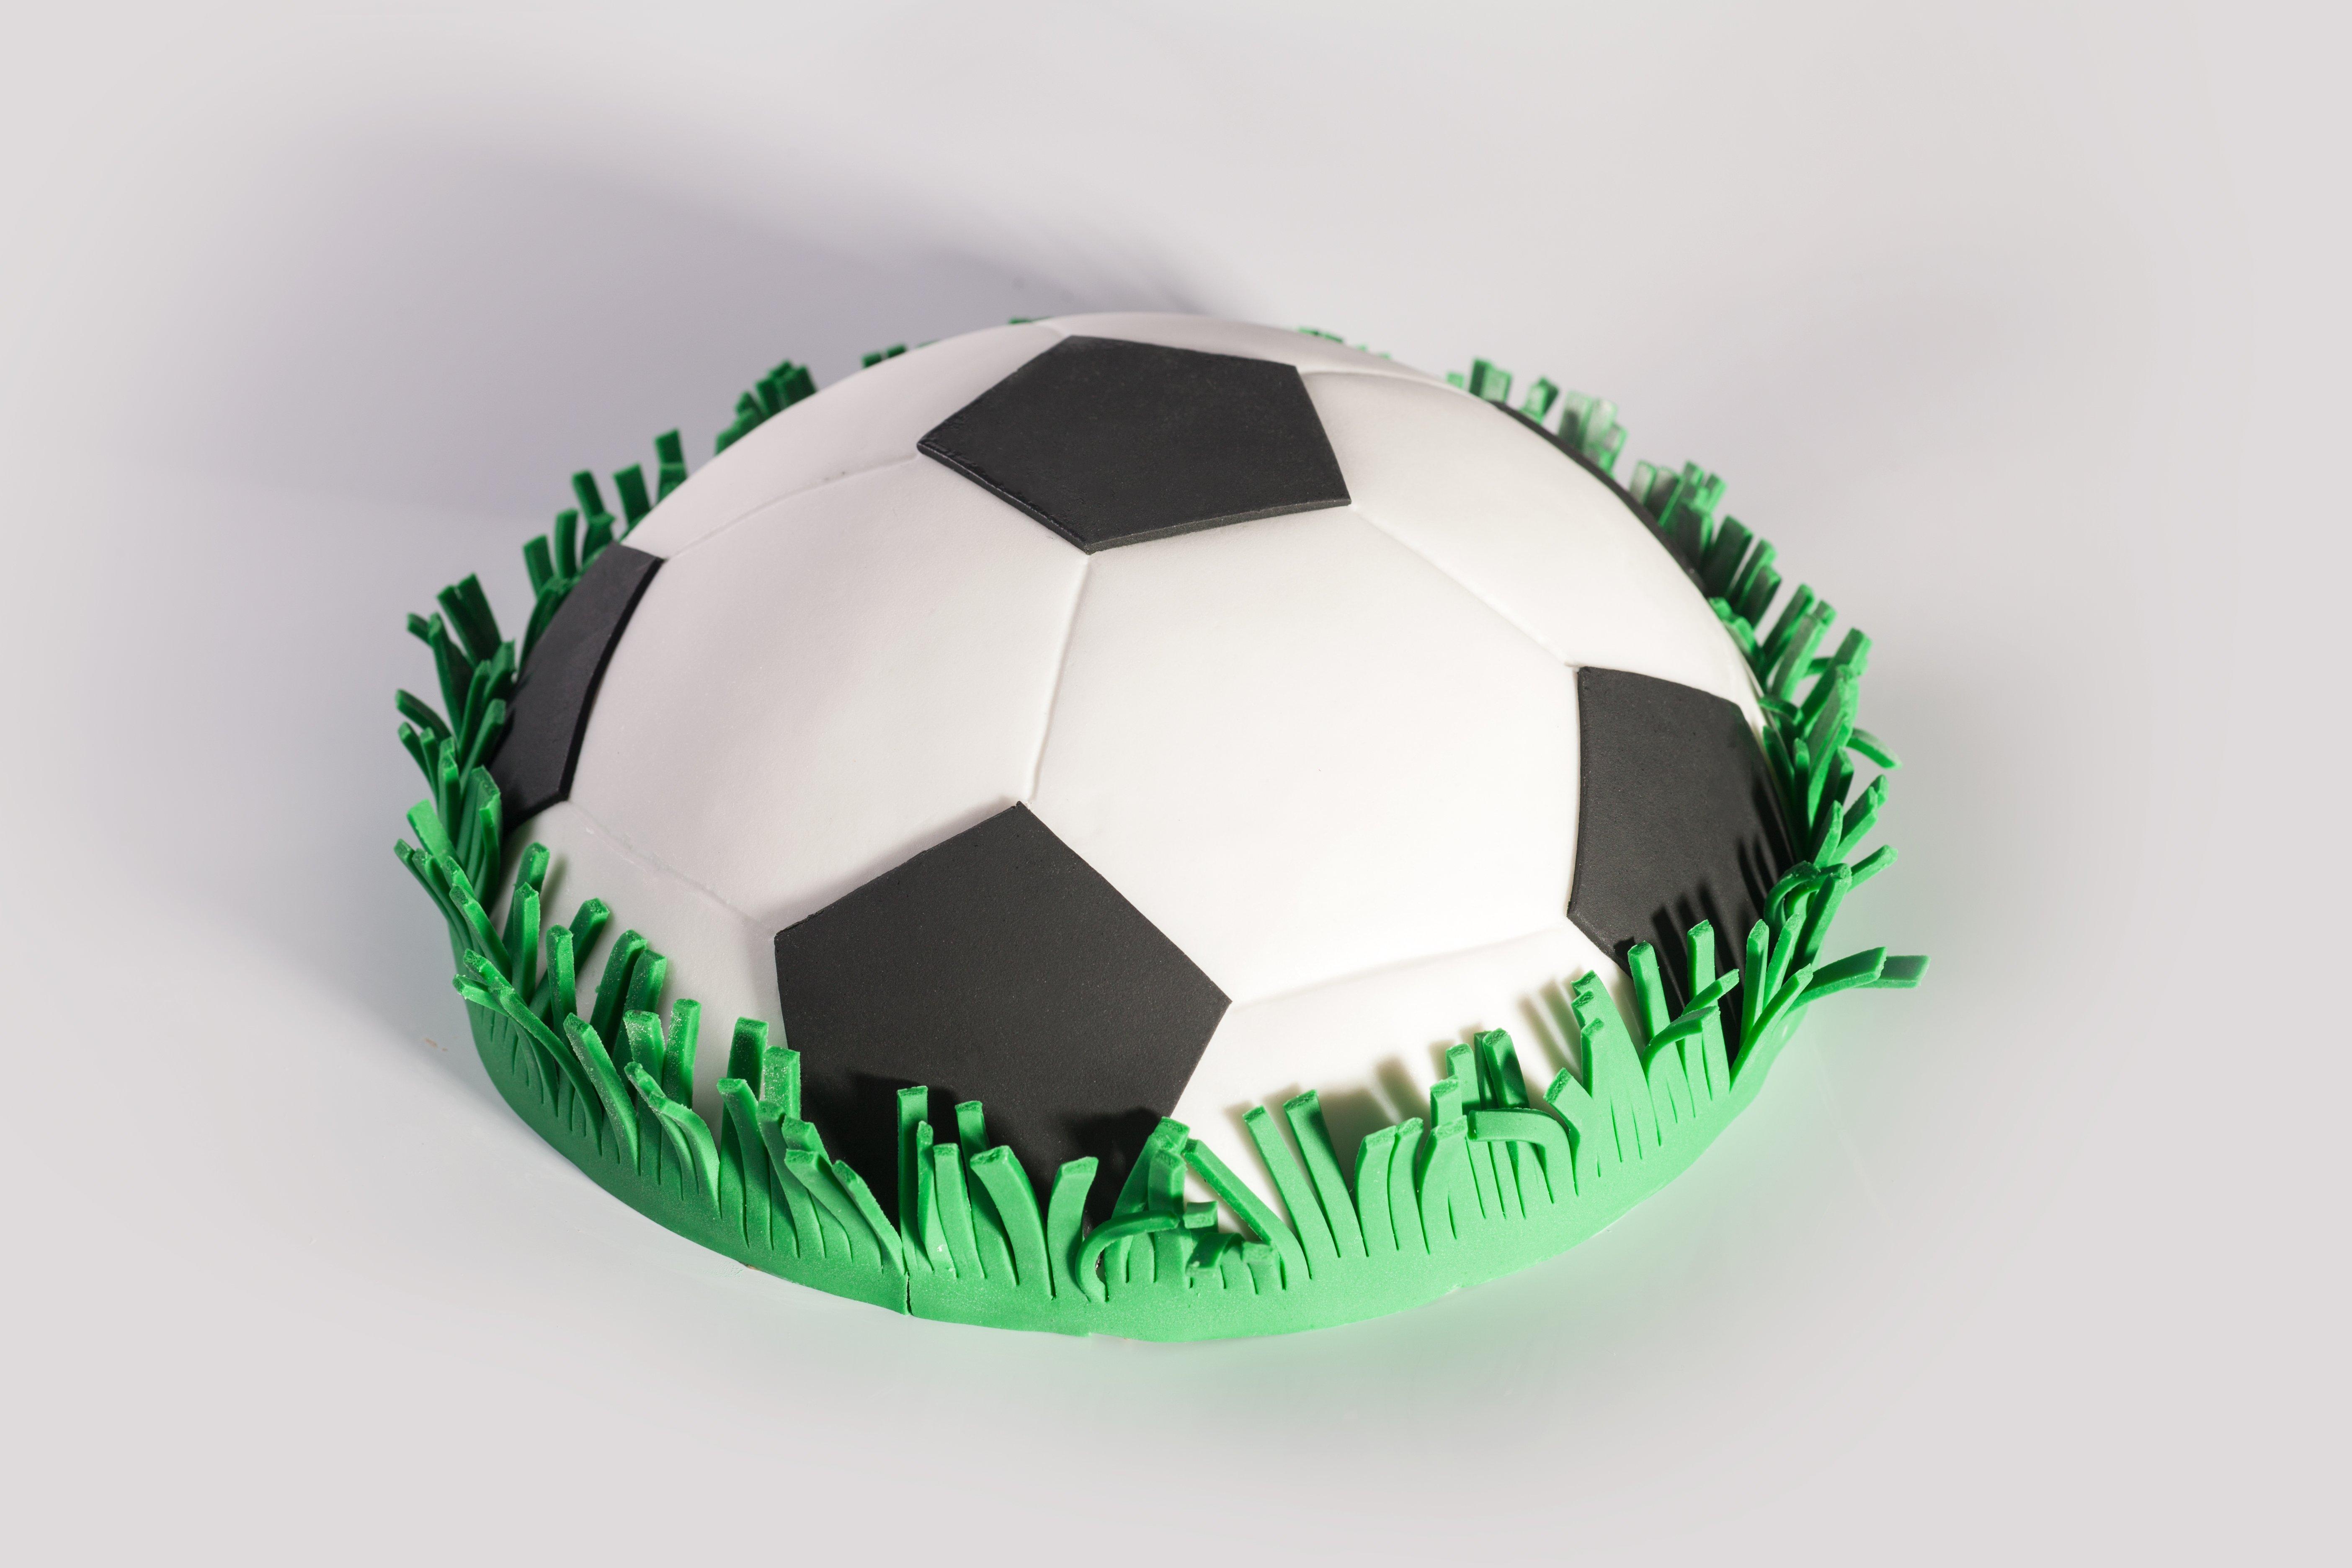 Фото в виде футбольного мяча